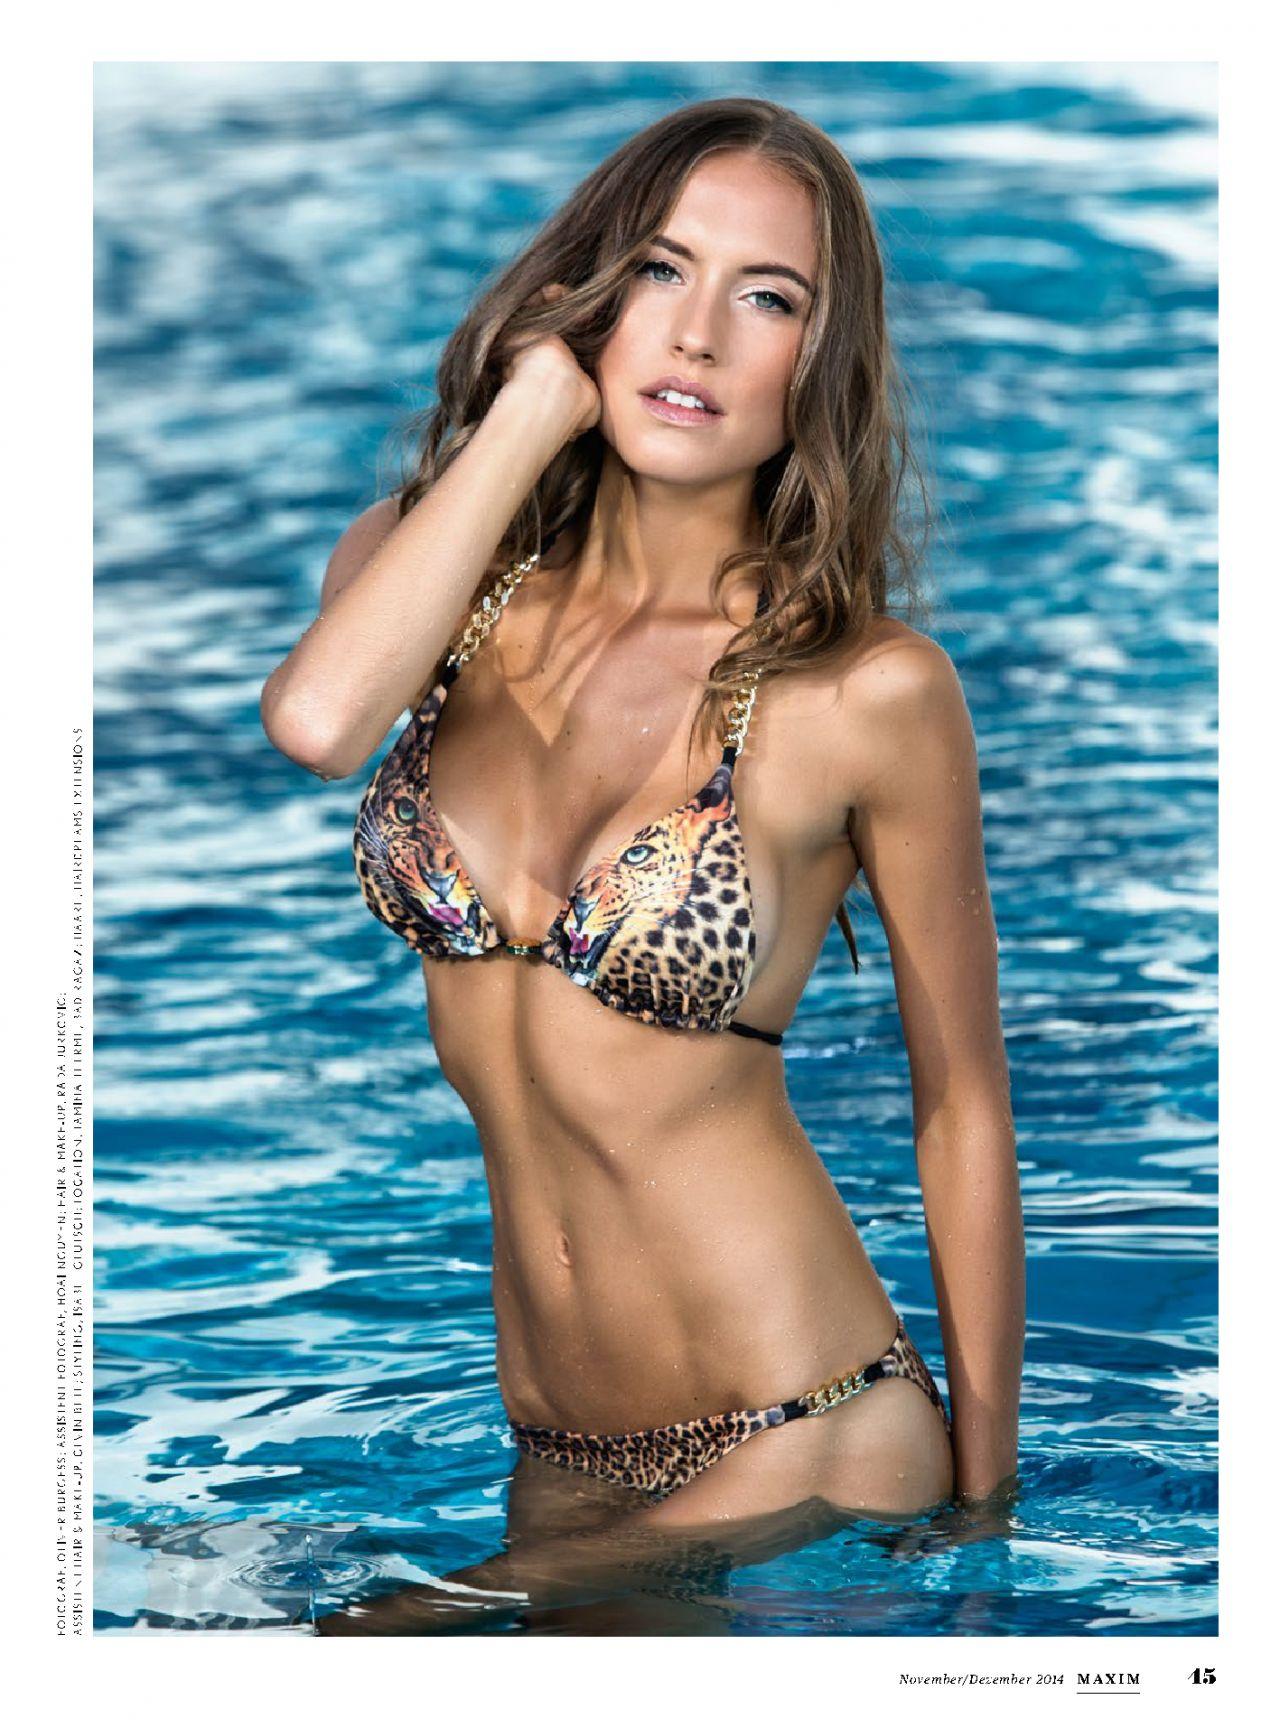 Alena Gerber - Maxim Magazine (Switzerland) November/December 2014 Issue